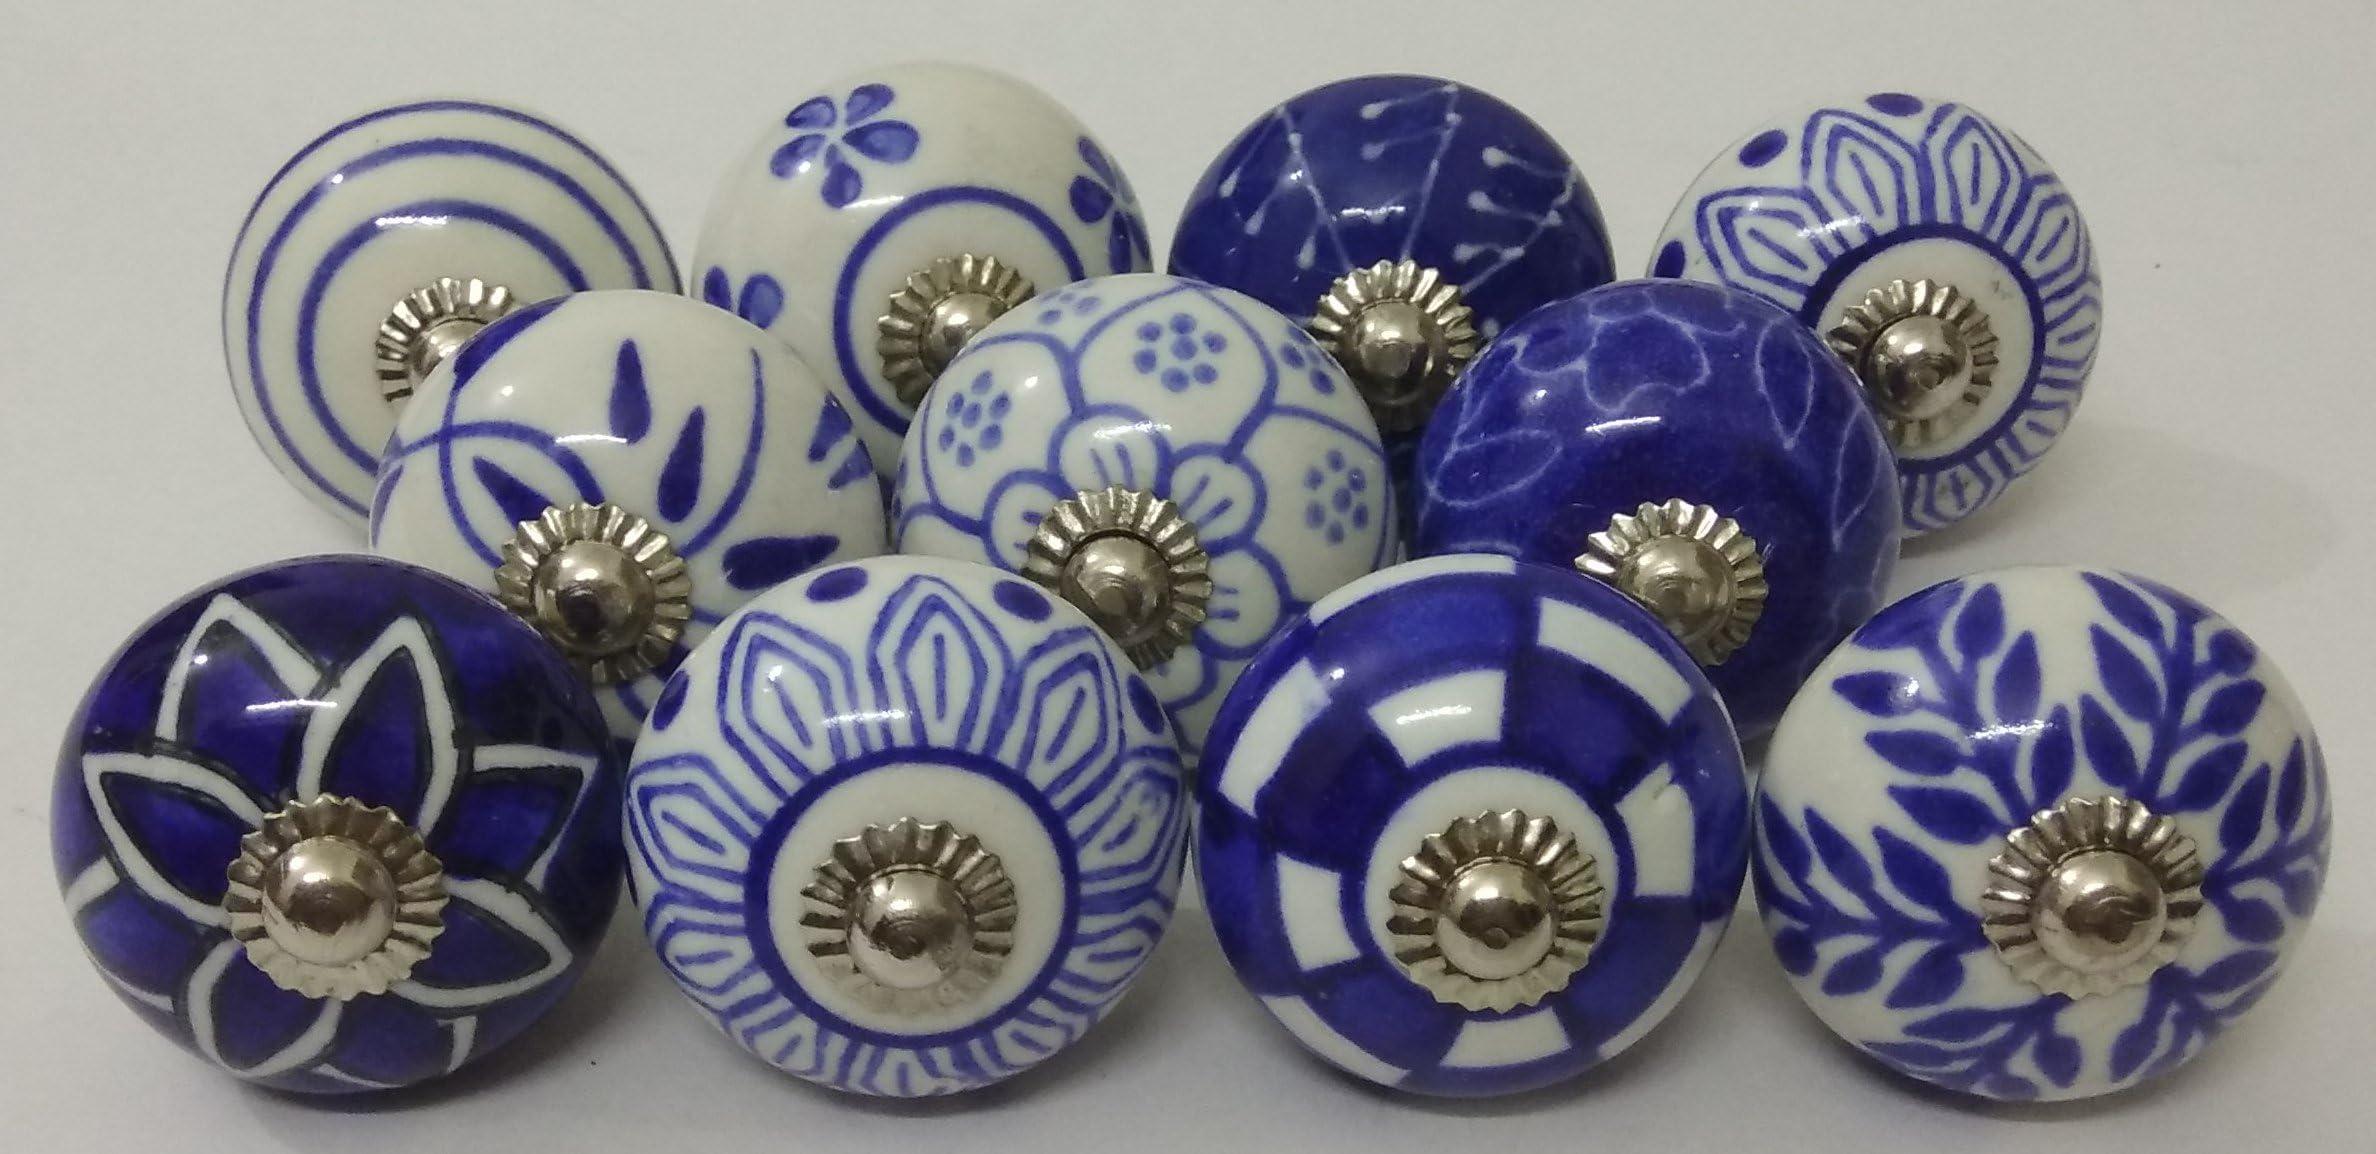 Blue and White Mixed Design Ceramic Knobs Kitchen Cabinet Drawer Knobs Hardware Knobs Drawer Knobs Cabinet Knobs Ceramic Door Knobs 8007